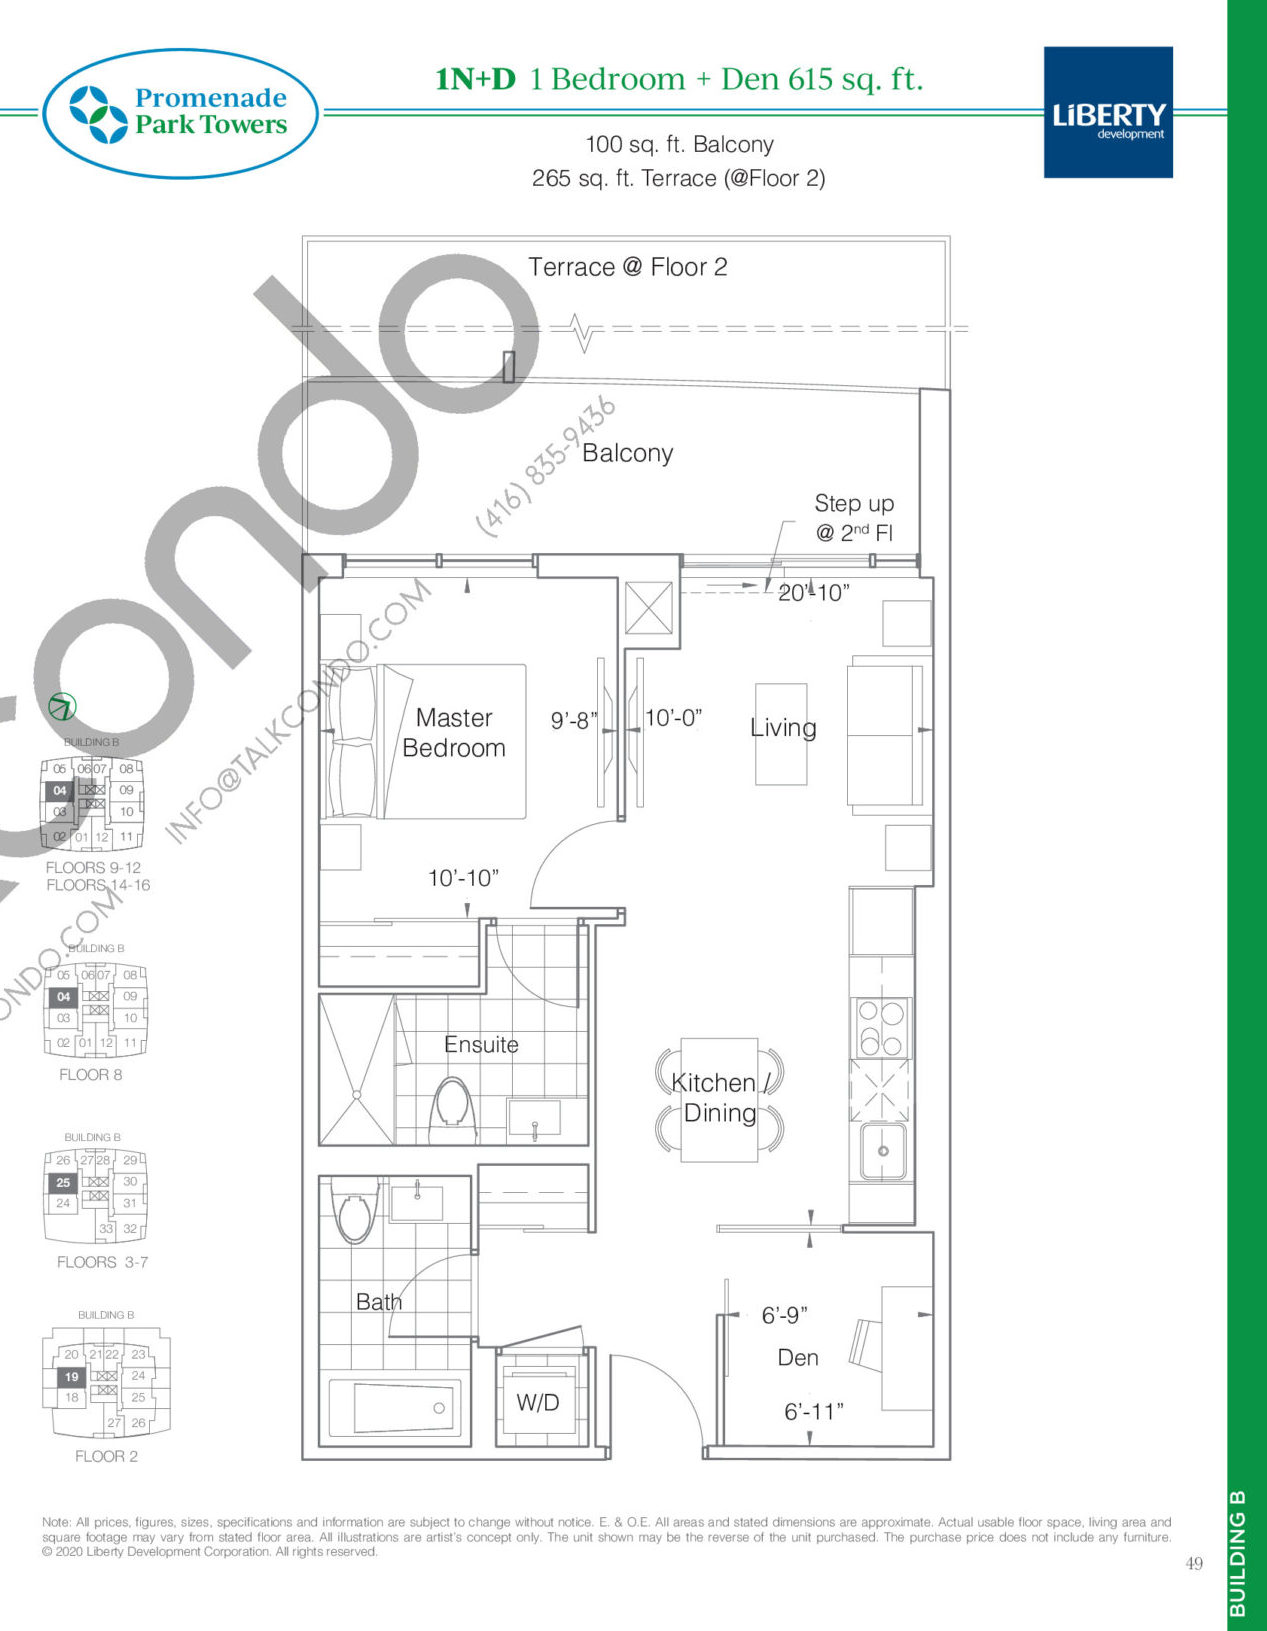 1N+D Floor Plan at Promenade Park Towers Phase 2 Condos - 615 sq.ft